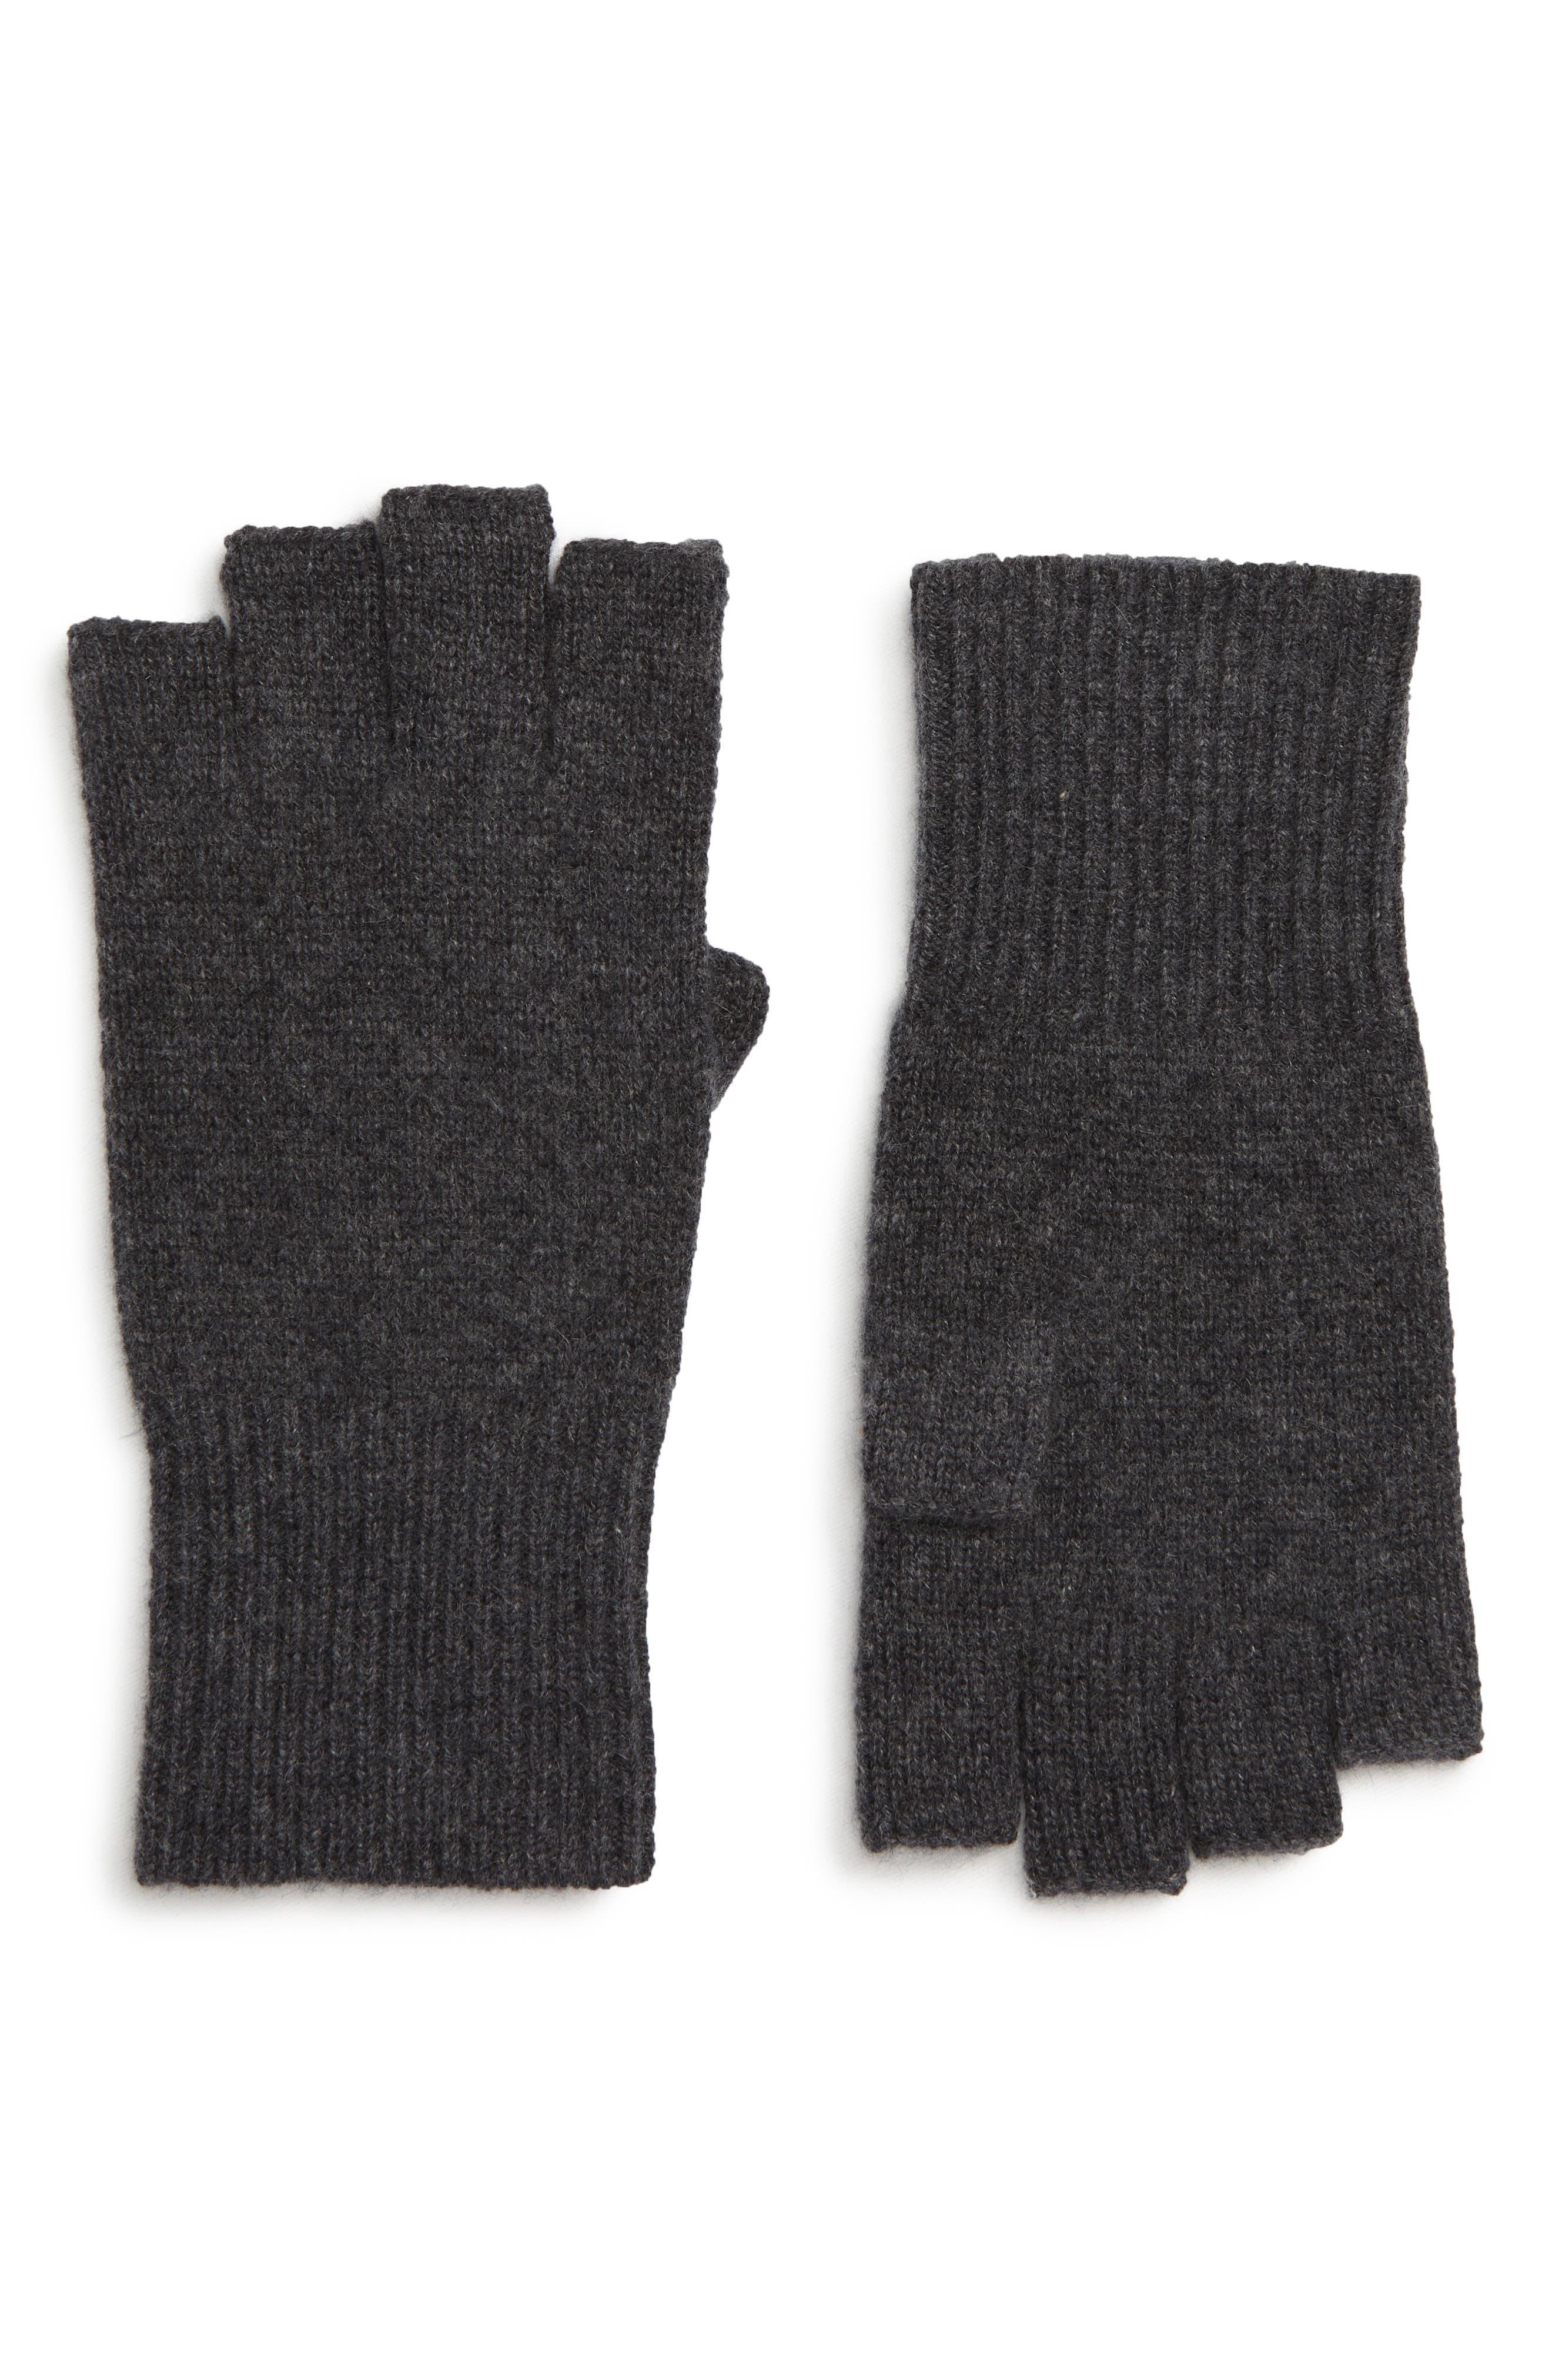 Cashmere Fingerless Gloves by Halogen